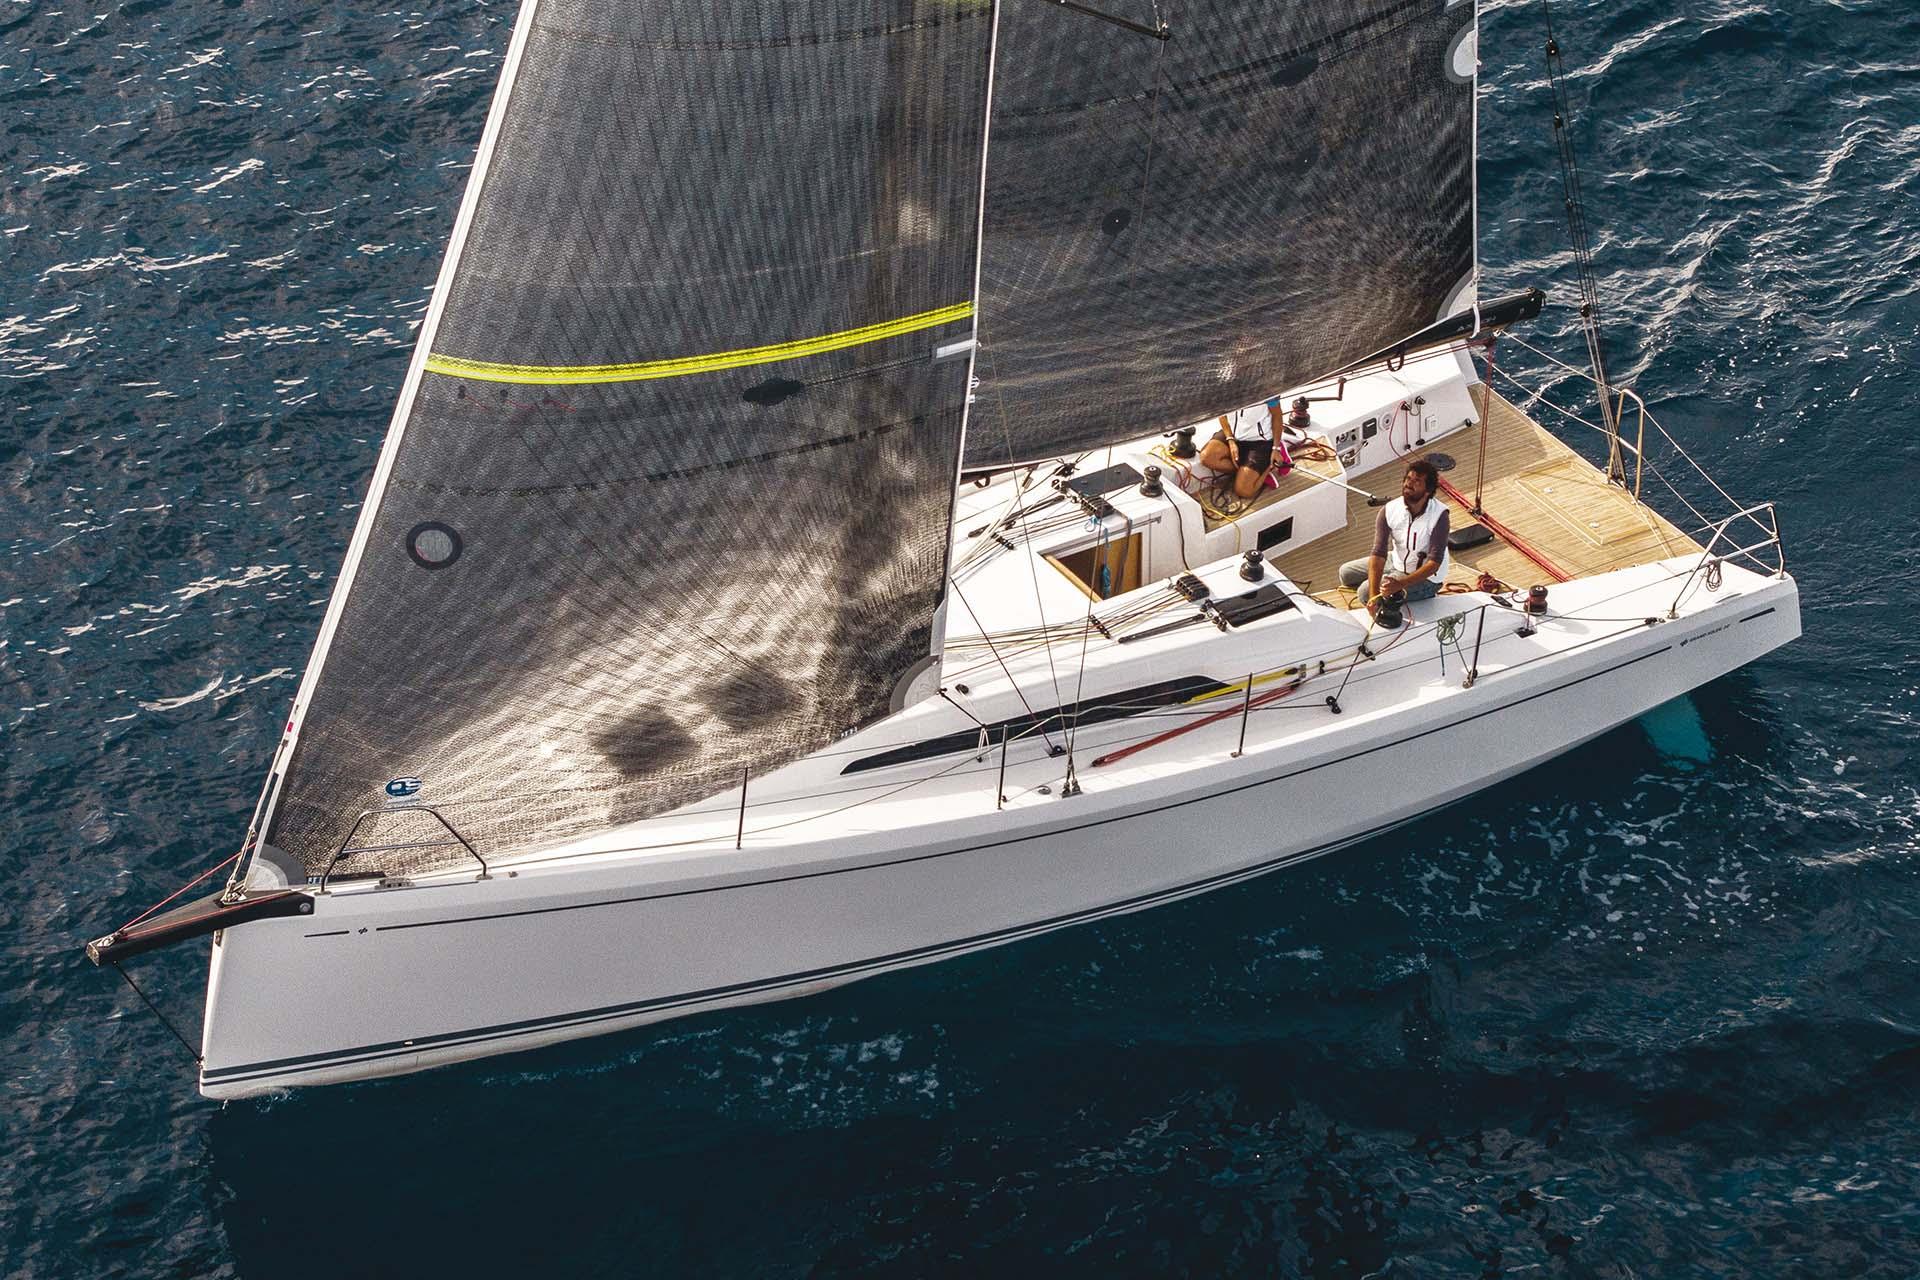 Barche a vela 10 metri: Grand Soleil 34